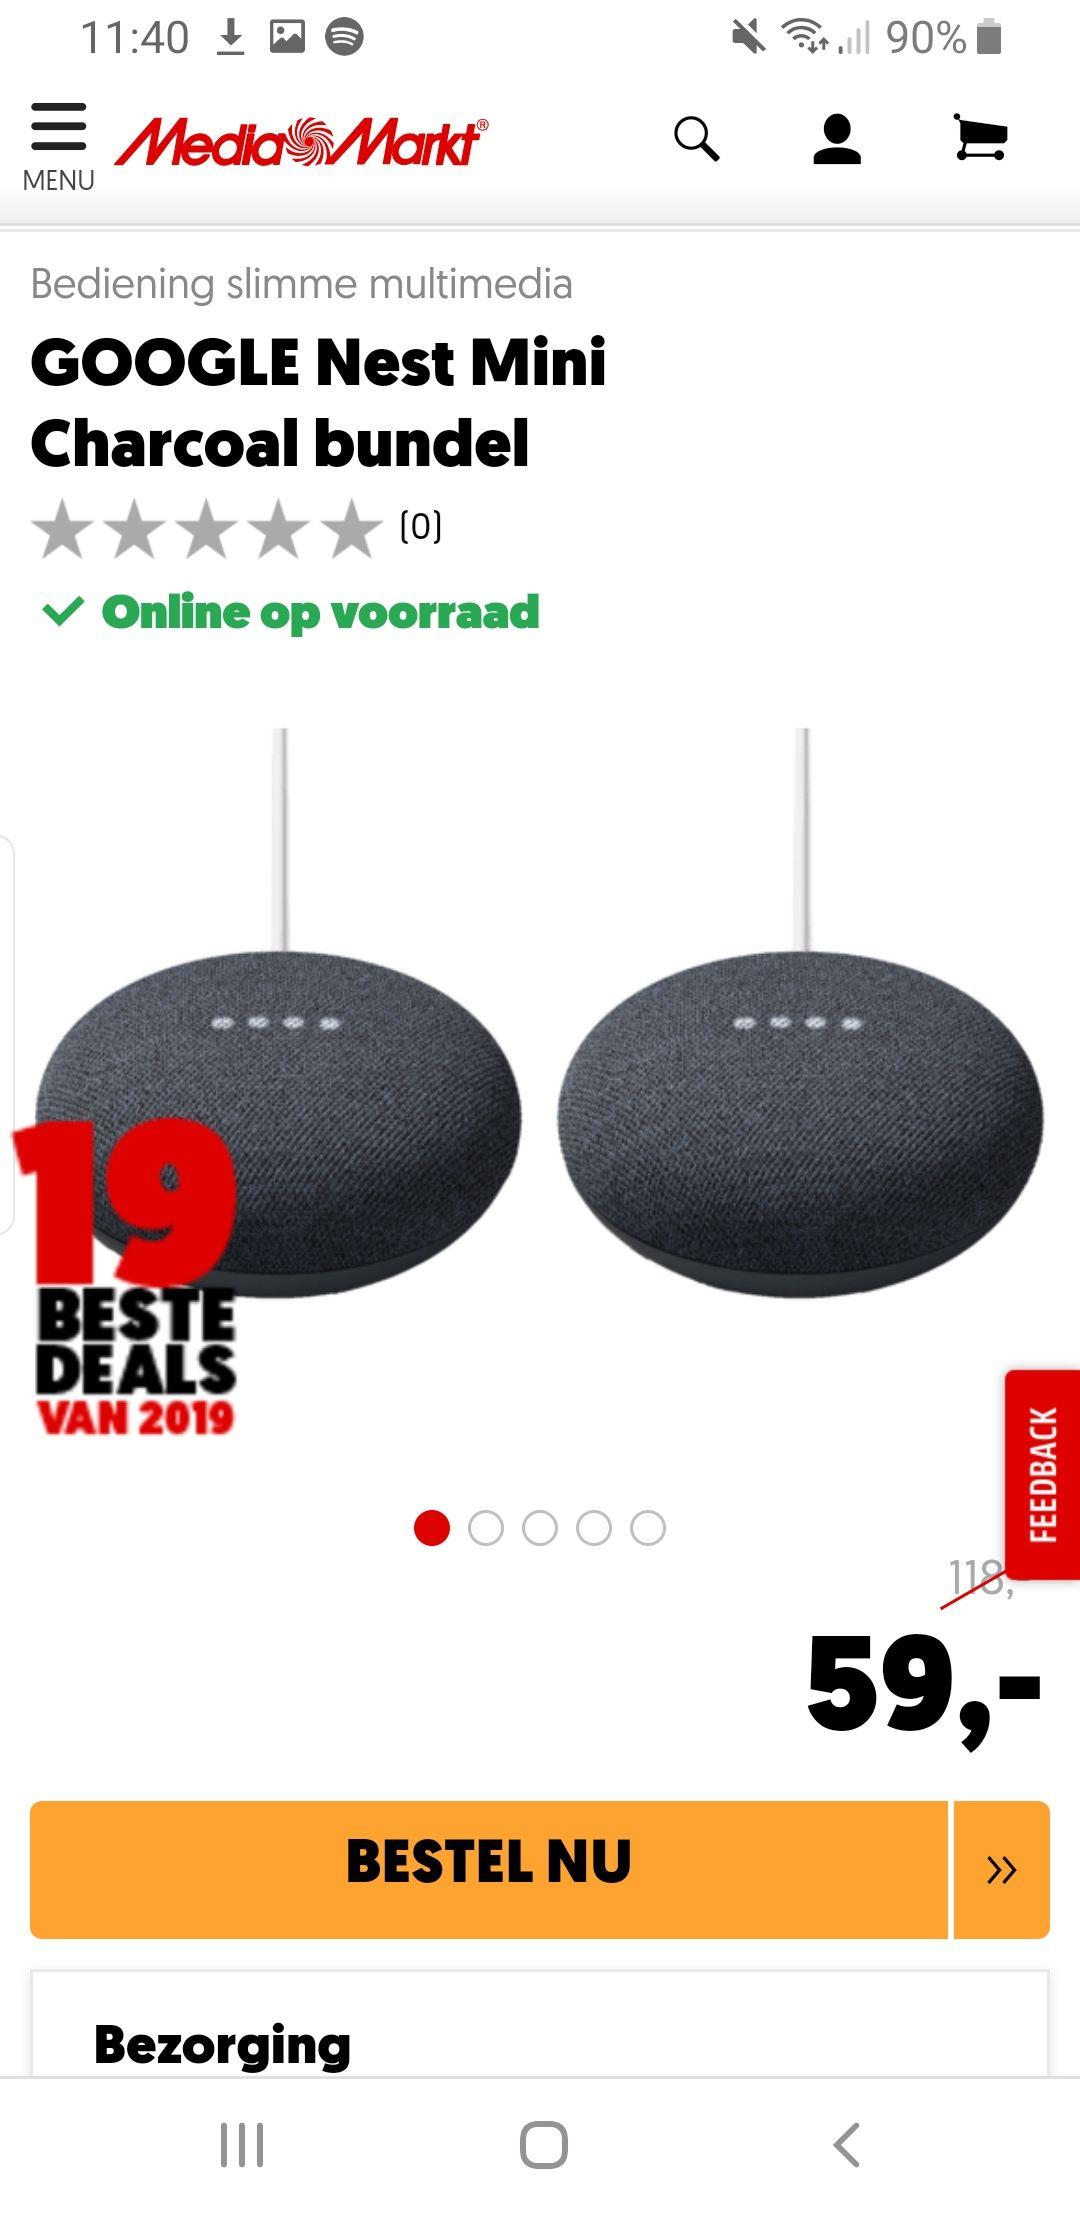 Bundel (2 stuks) Google Nest mini